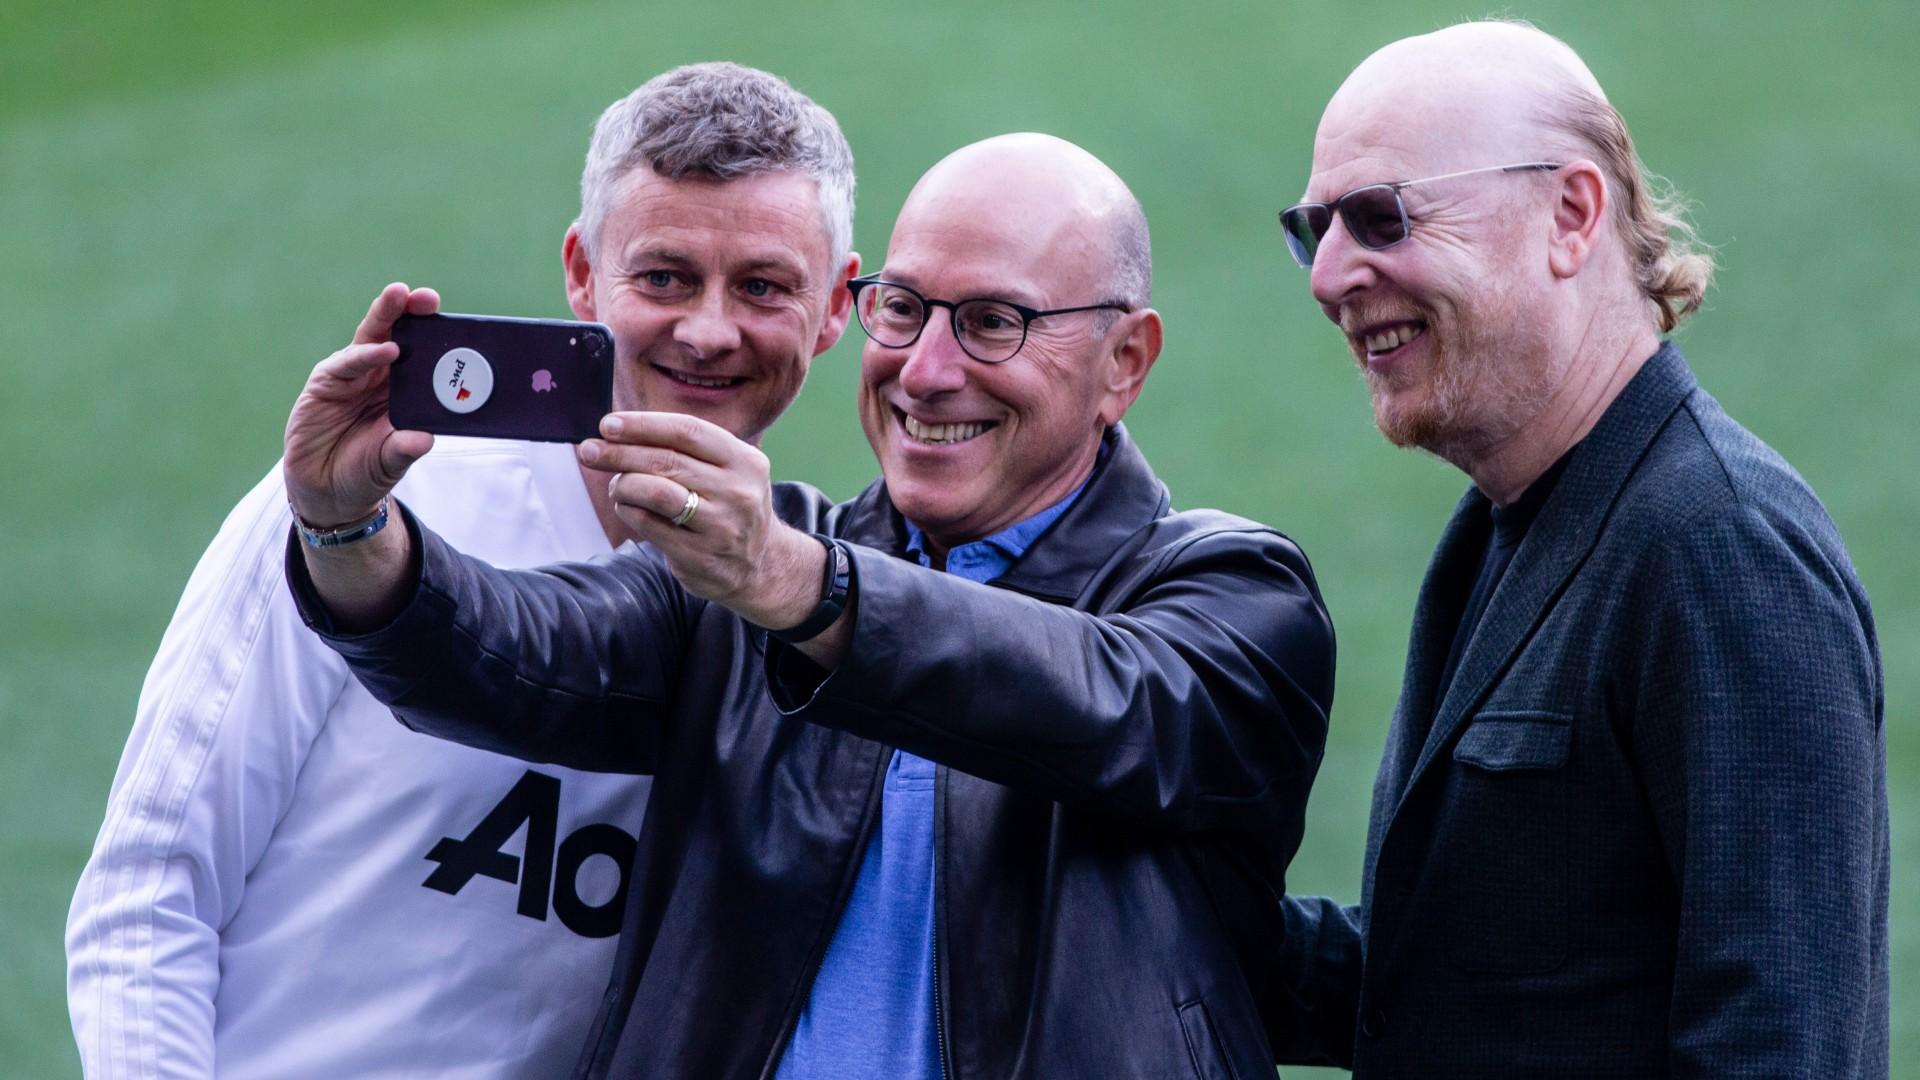 European Super League: Man Utd co-chairman Glazer talks up 'increased financial support for wider football pyramid'